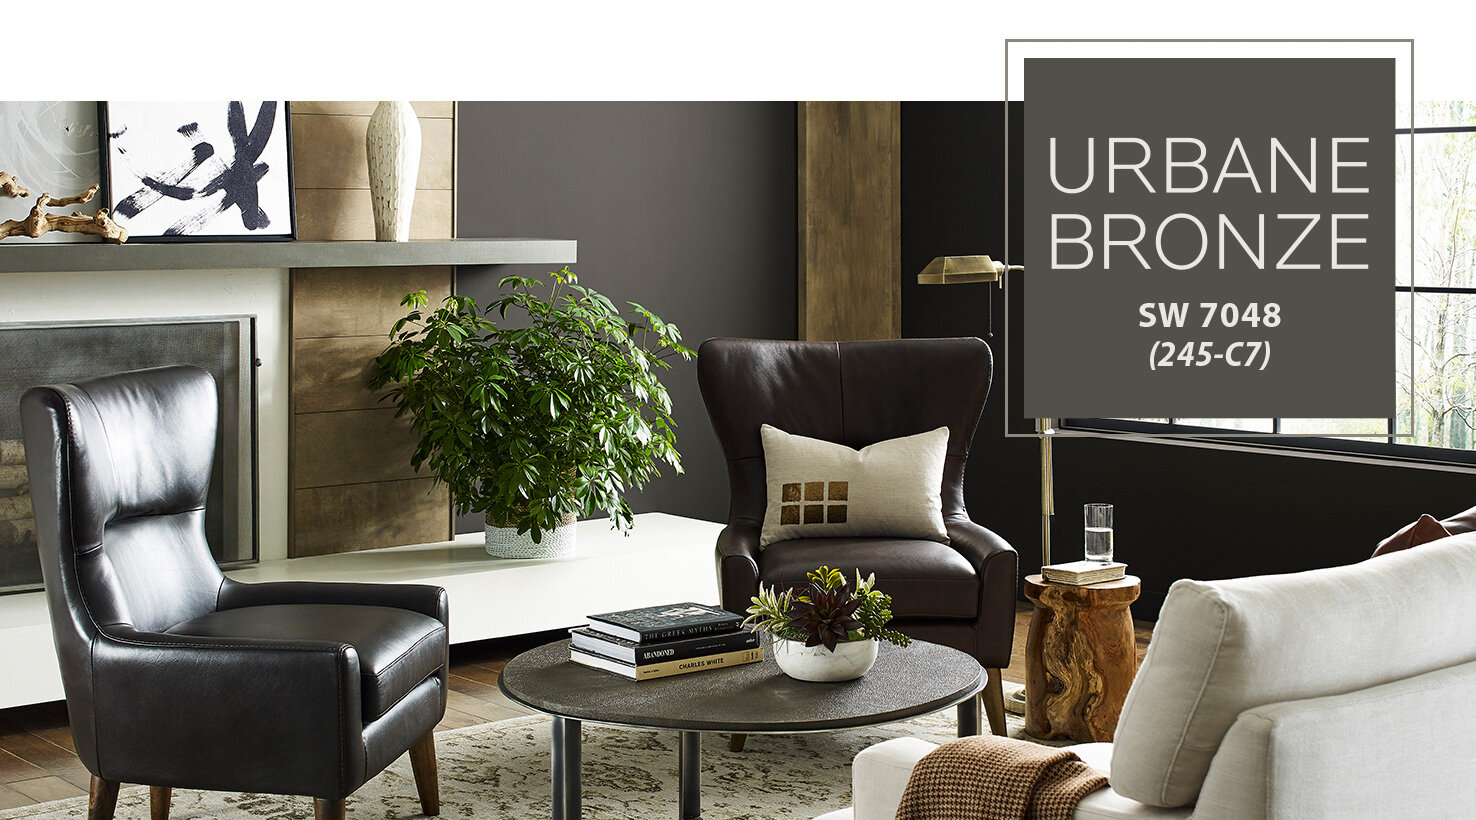 Urban Bronze in contemporary living room. Photo via Sherwin Williams.com